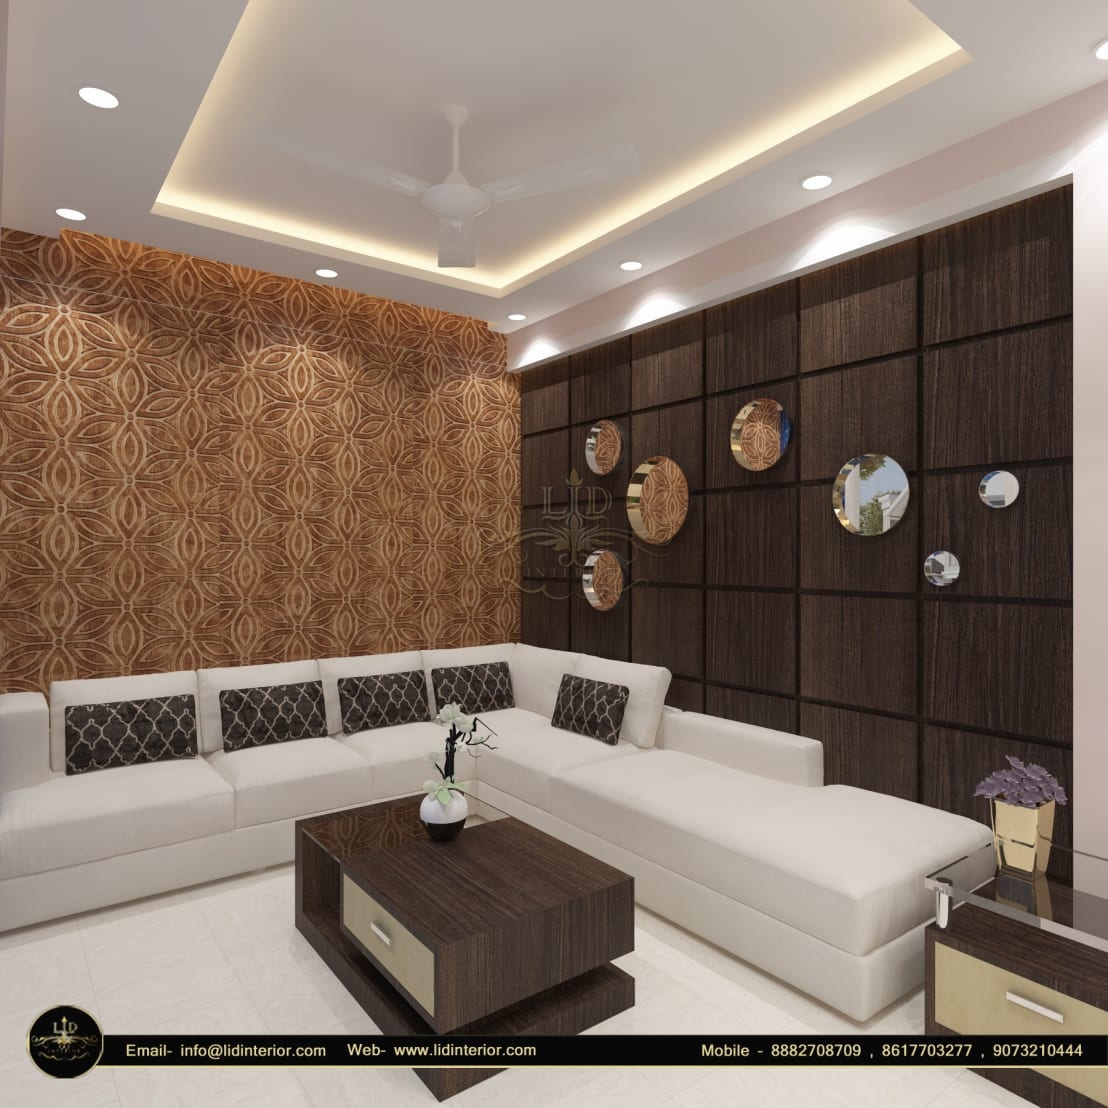 Dr Anamika Roy S Latest Modern 3 Bhk Flat Interior Design Decoration Action Area 1 Kolkata Lid Interior Pvt Ltd Homify